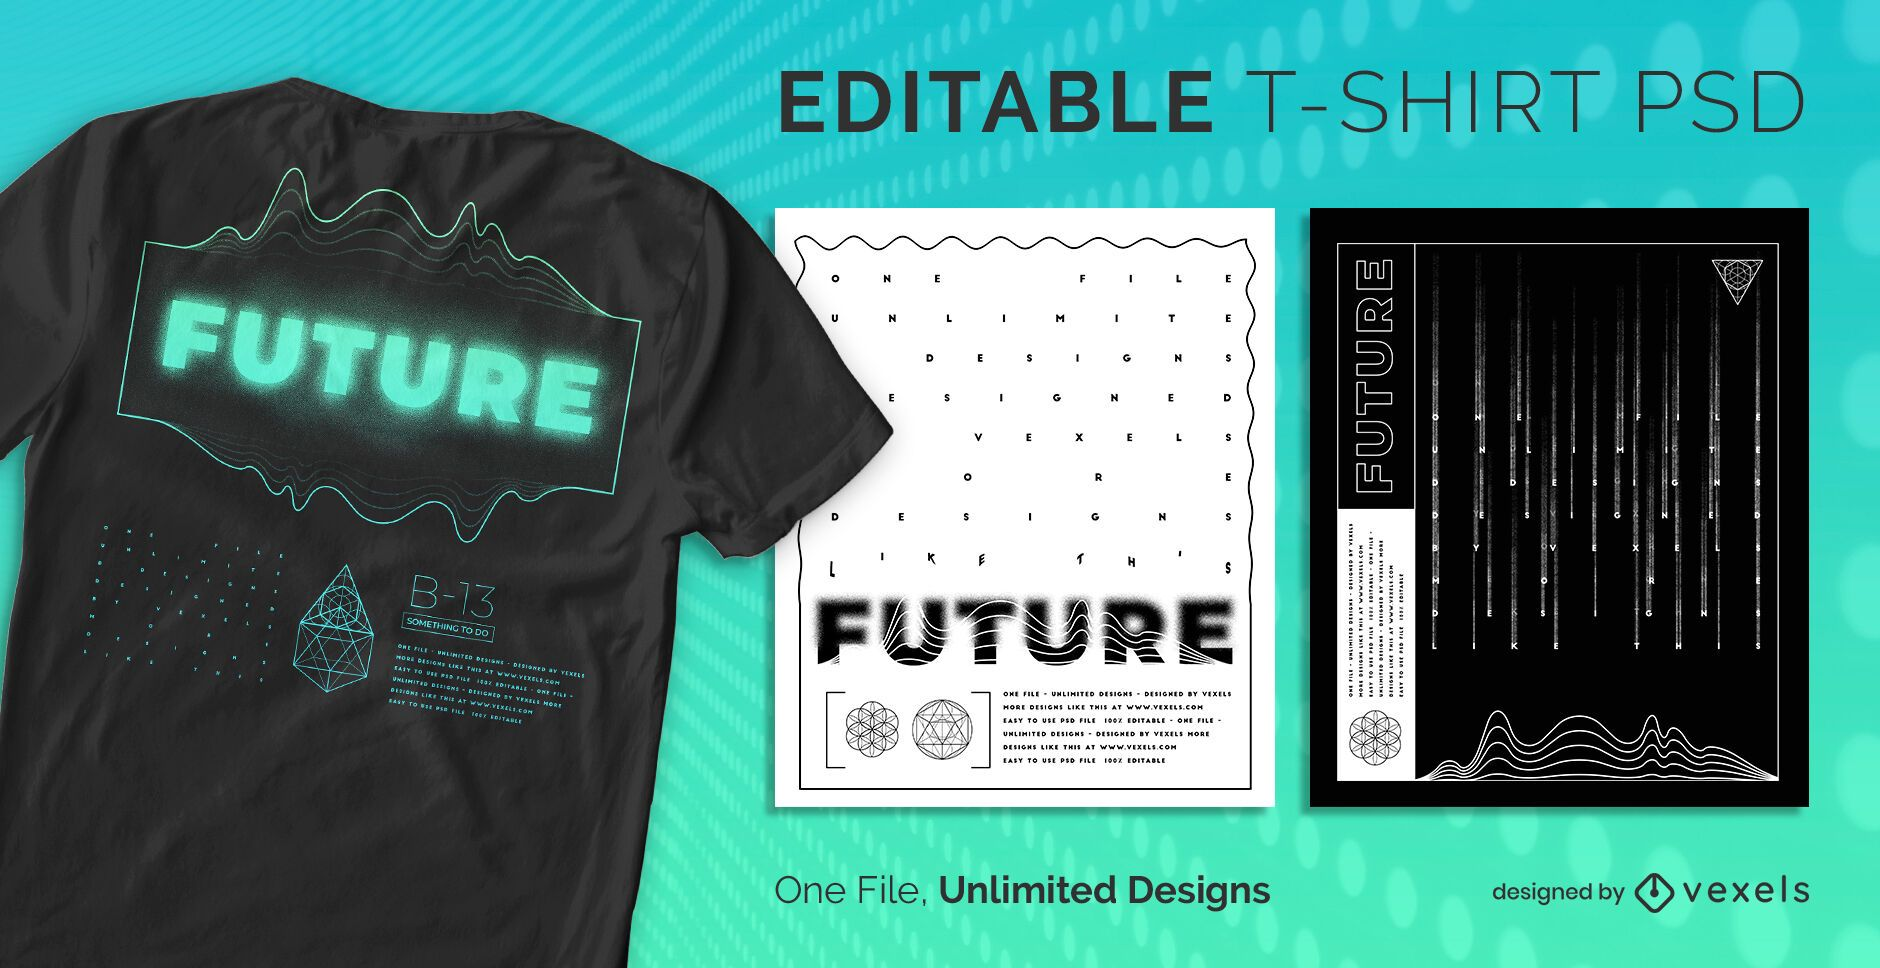 Camiseta escalable futurista minimalista psd